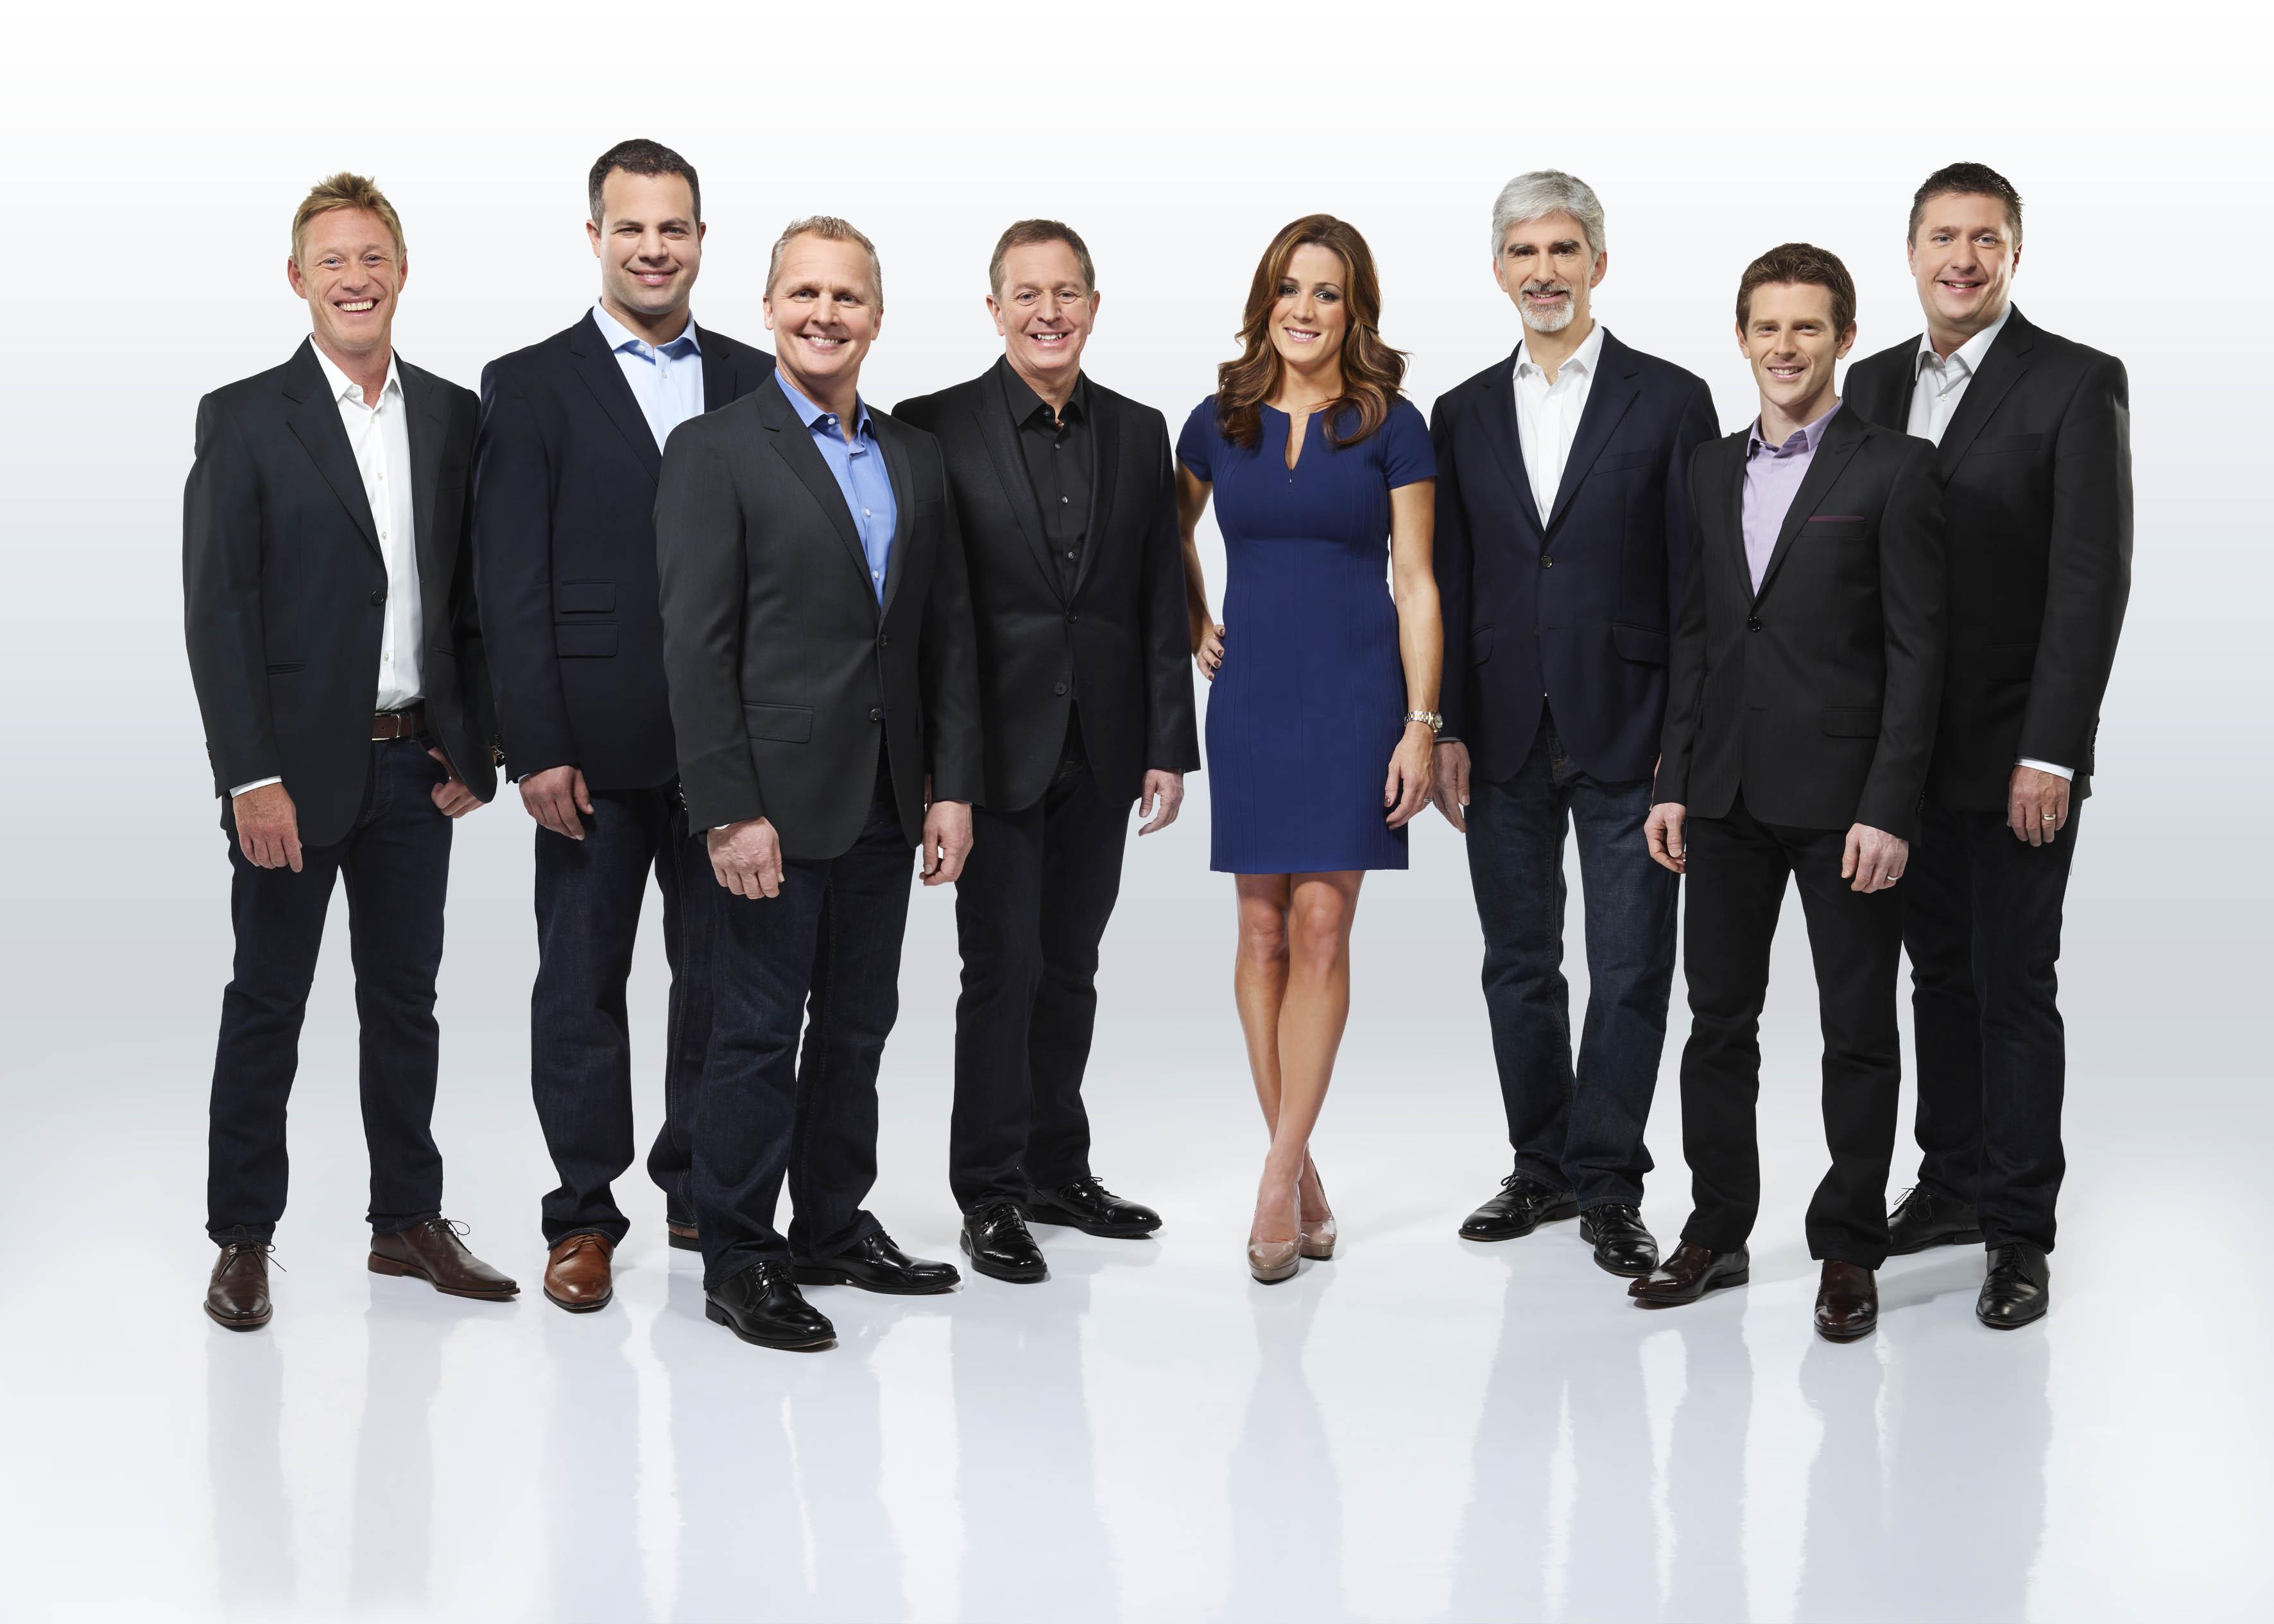 f1-presenters-group-2013.jpg